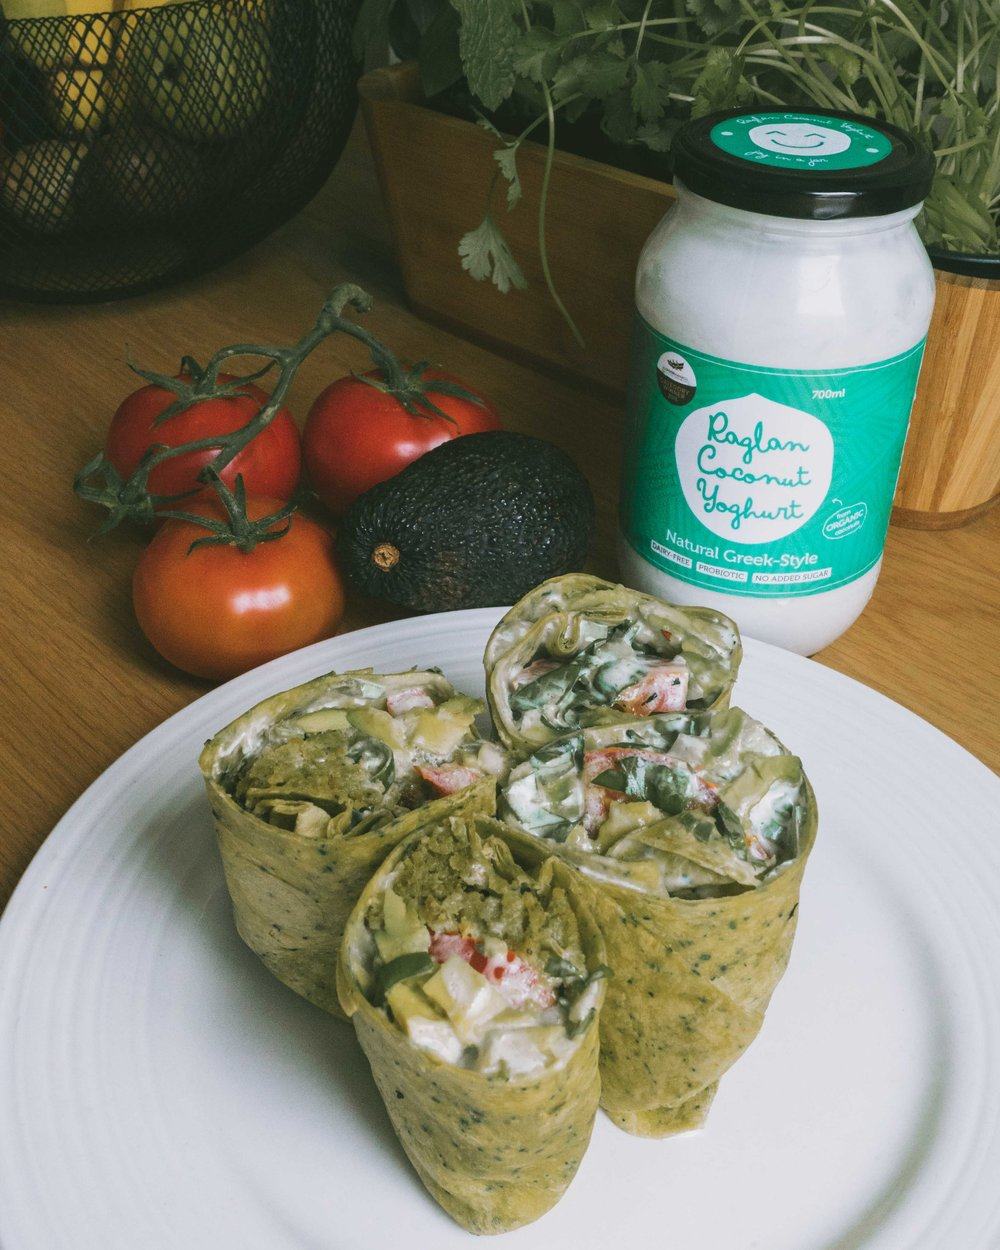 Falafel wraps with the Greek-Style yoghurt made into a tzatziki sauce.